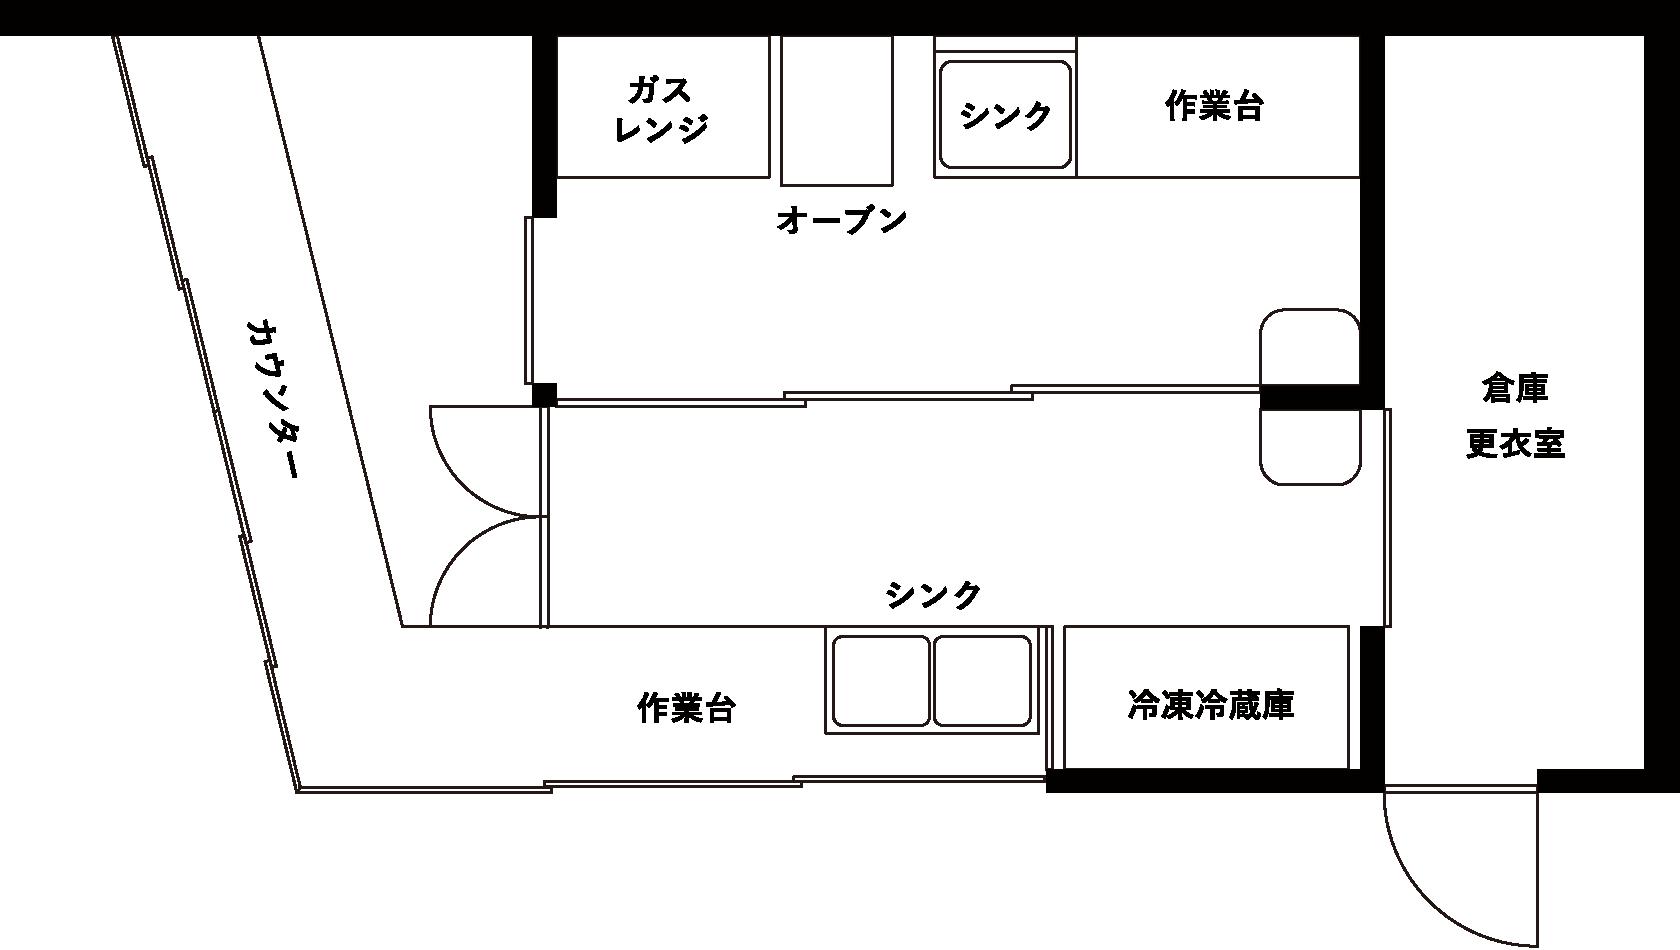 8K 武蔵境の図面